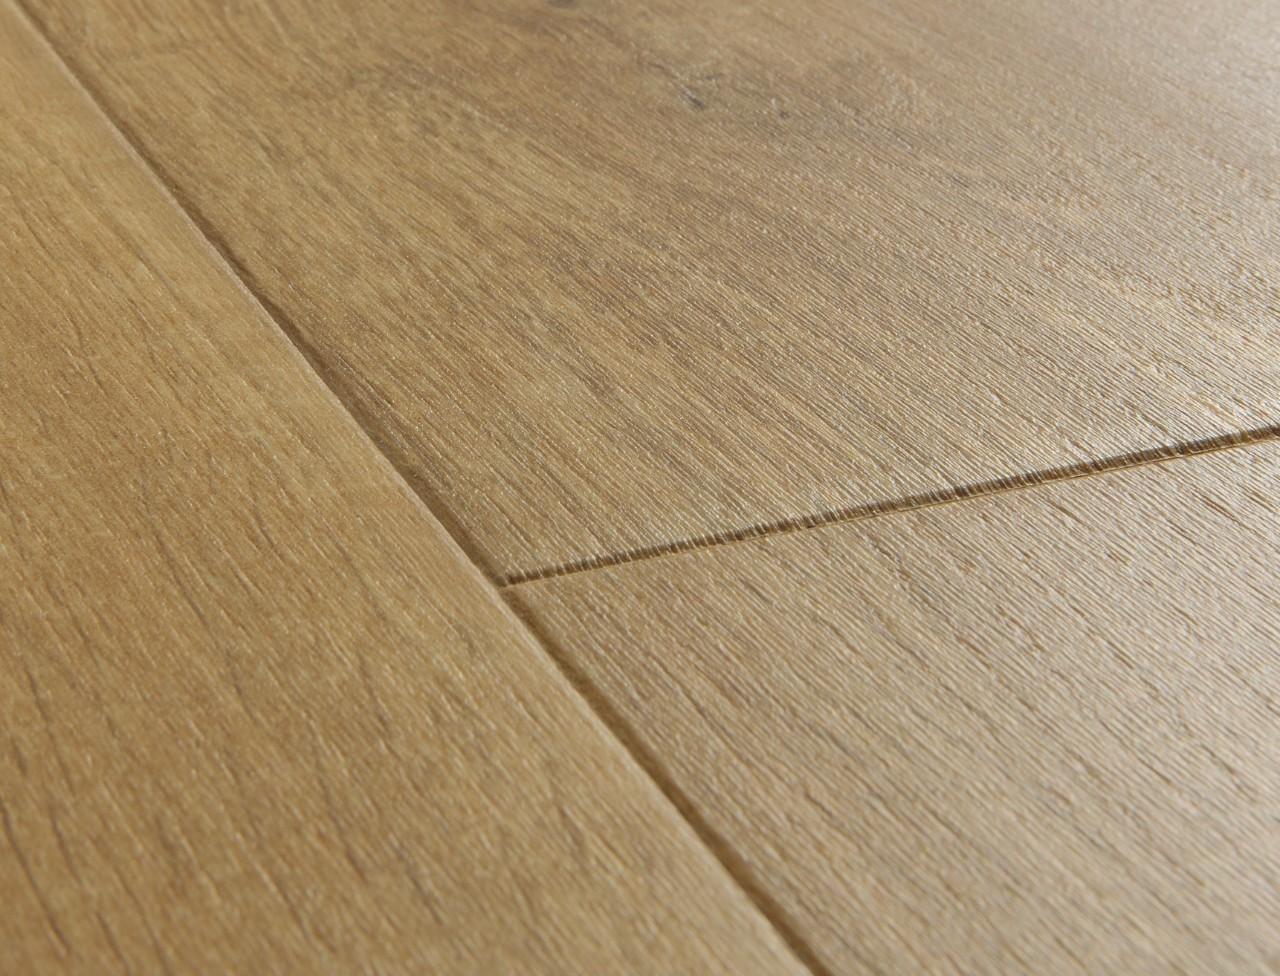 Imu1855 Soft Oak Natural Beautiful Laminate Timber